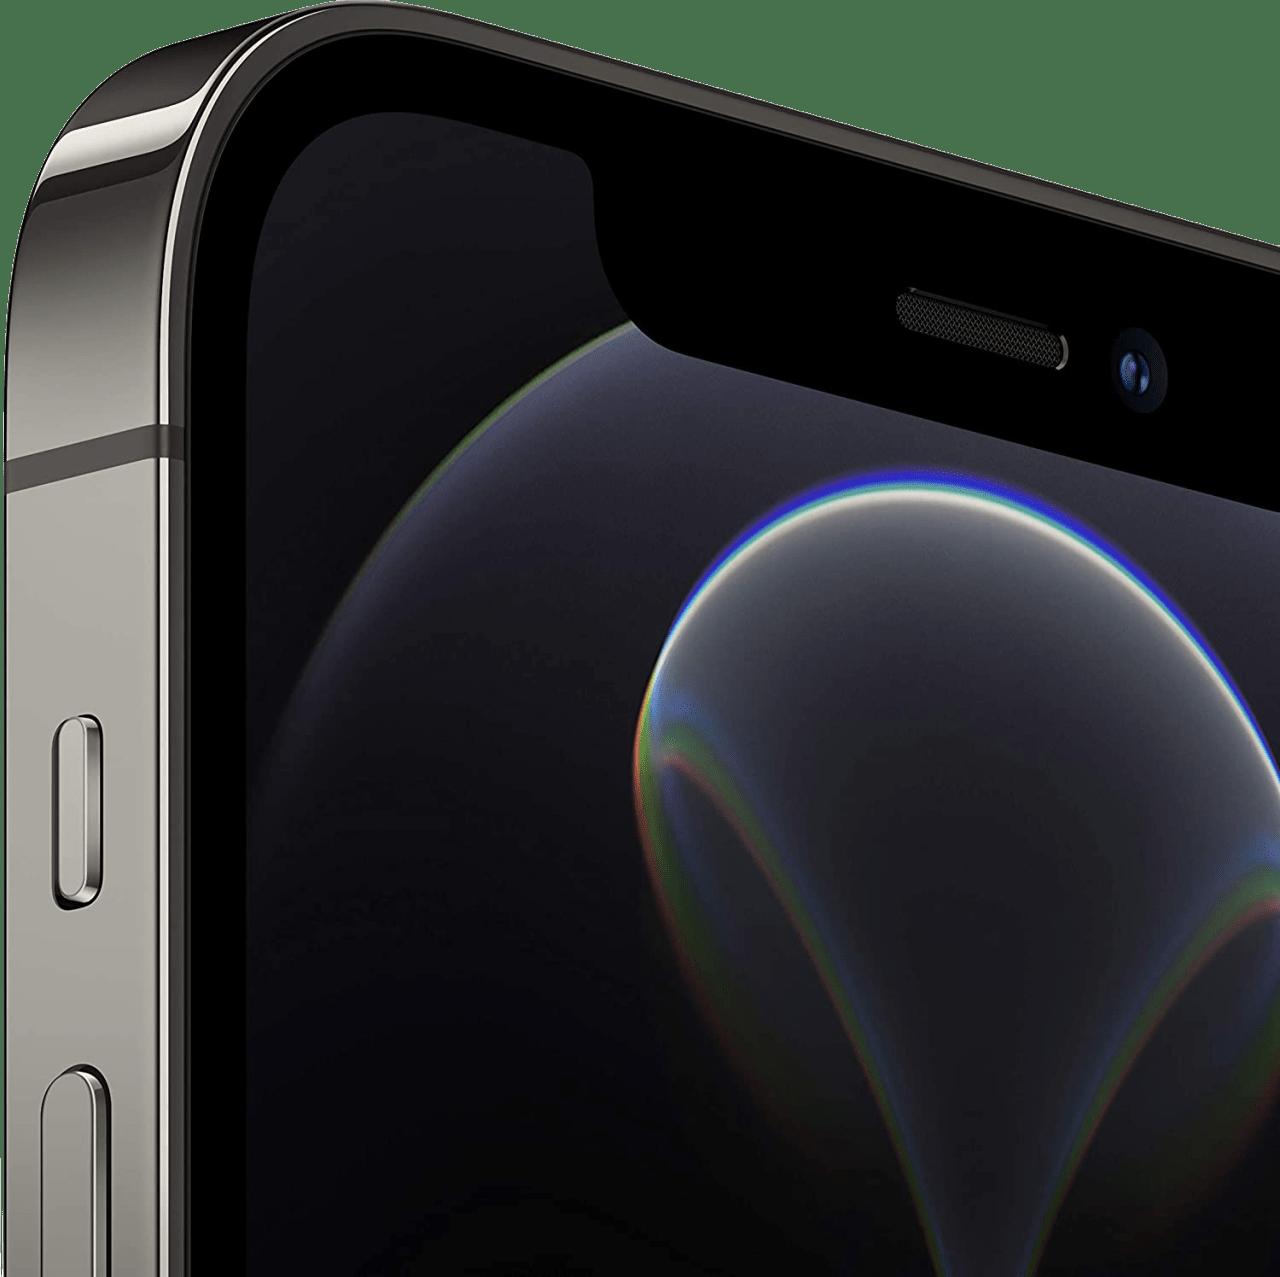 Grau Apple iPhone 12 Pro Max 128GB.3